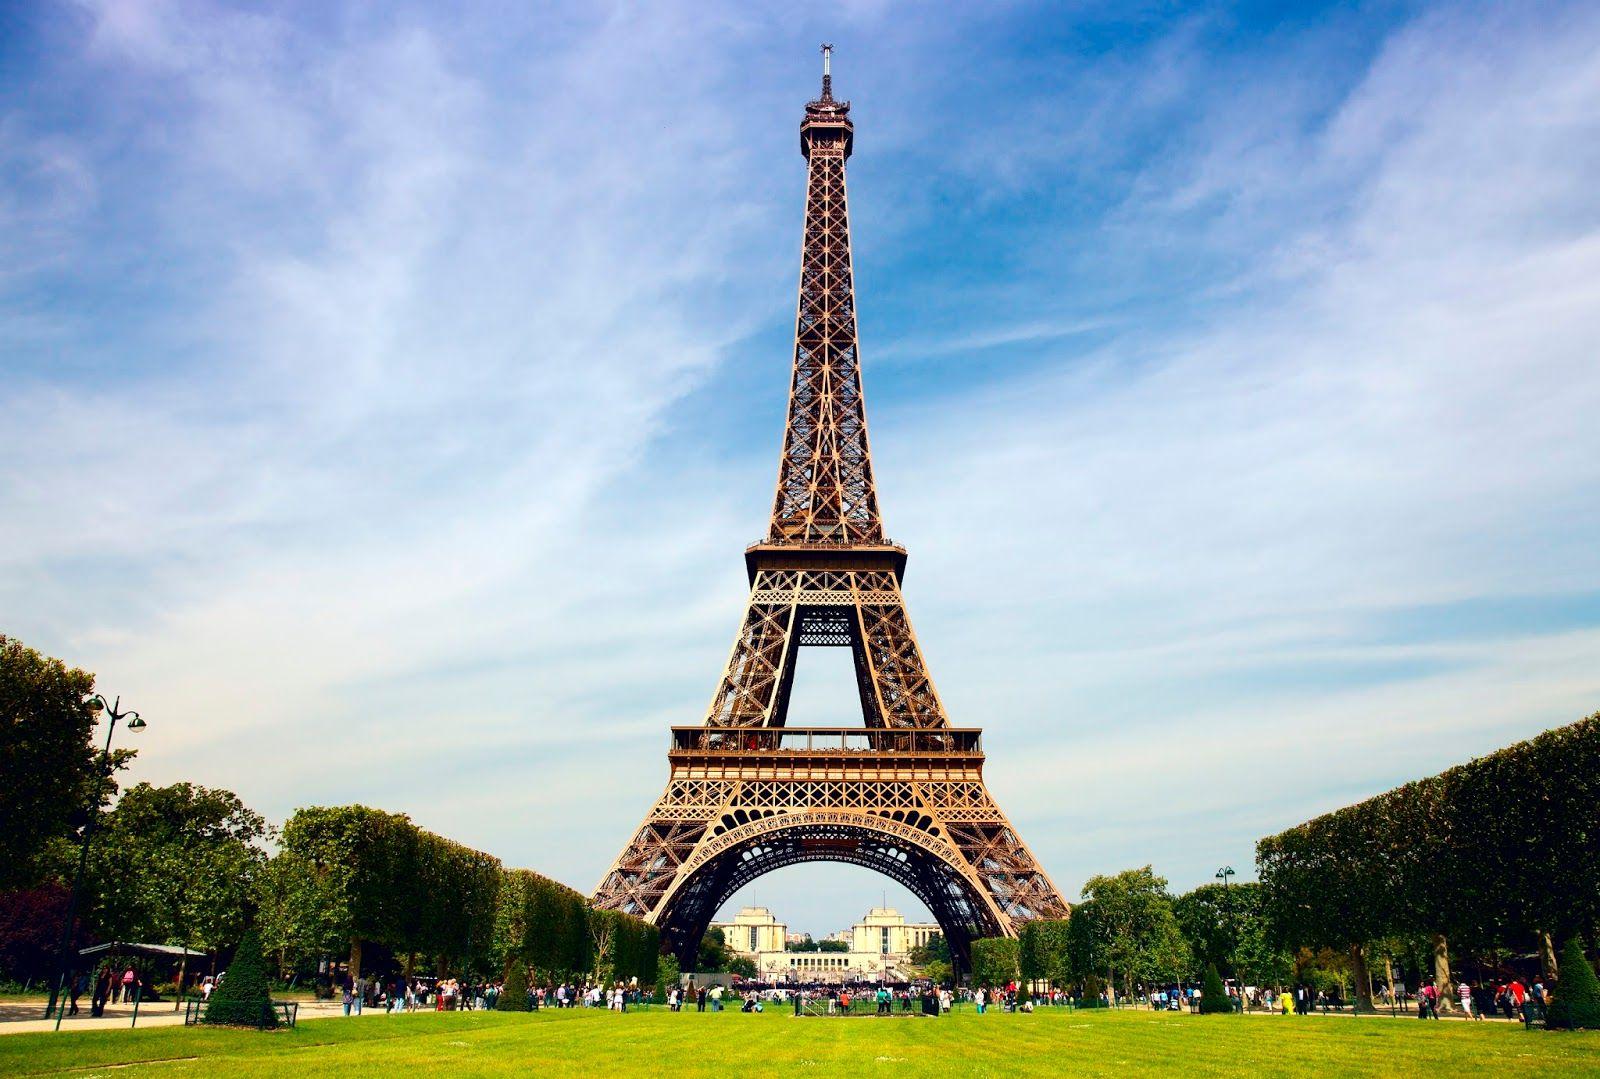 Menara Eiffel In Paris Eiffel Tower Tour Eiffel Paris Travel